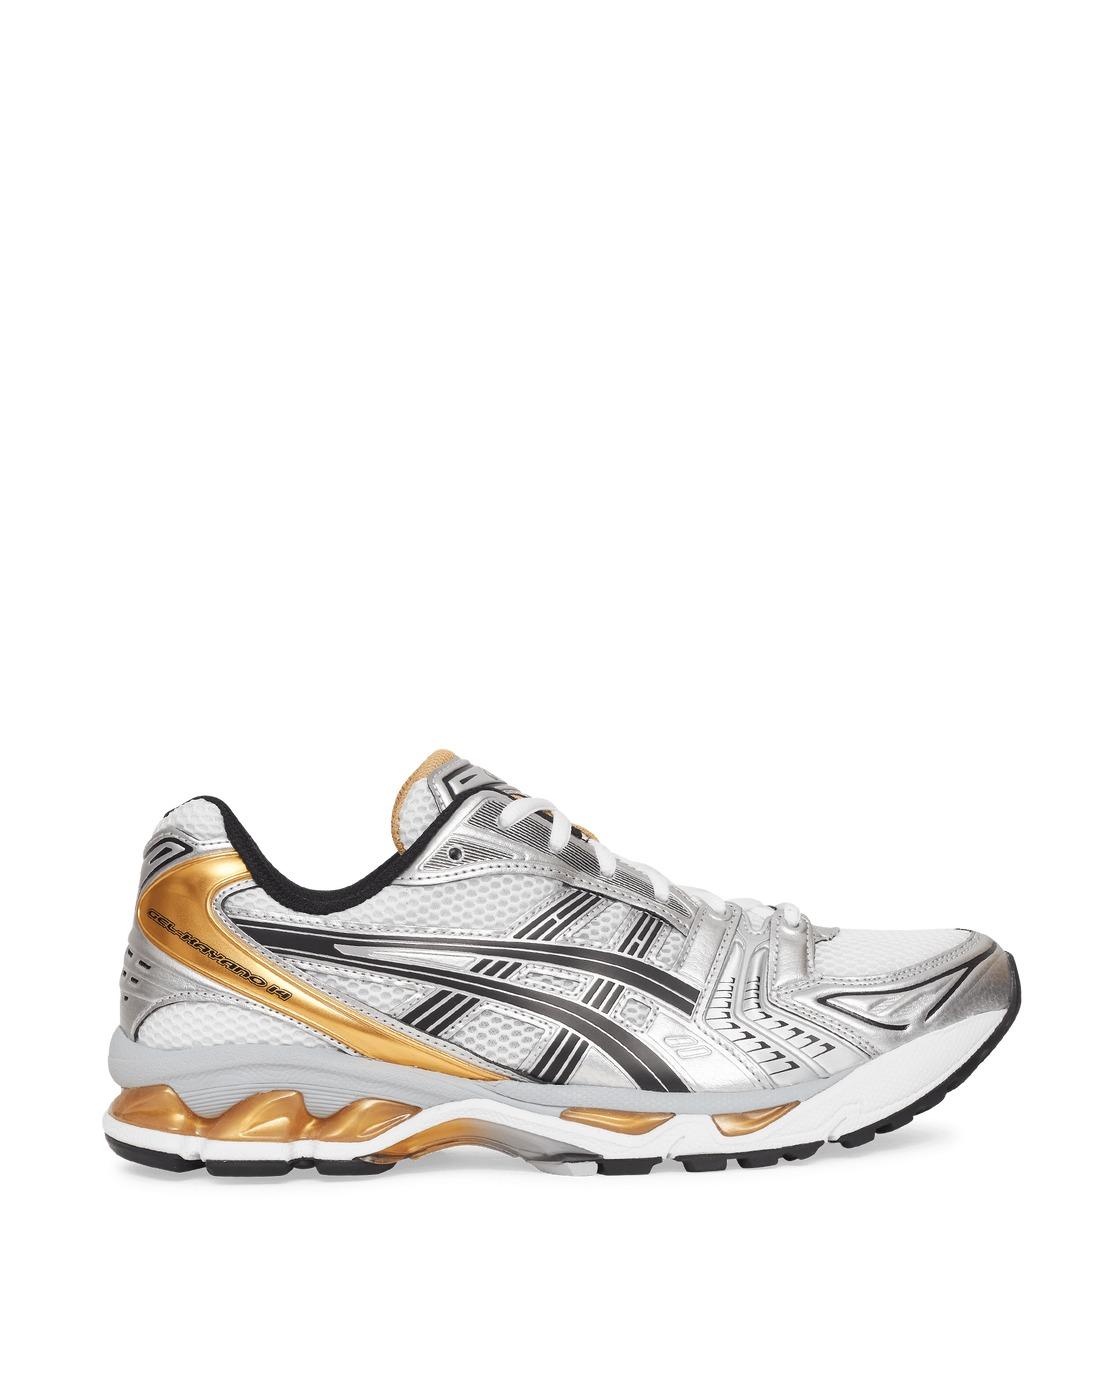 Asics Gel Kayano 14 Sneakers White/Pure Gold